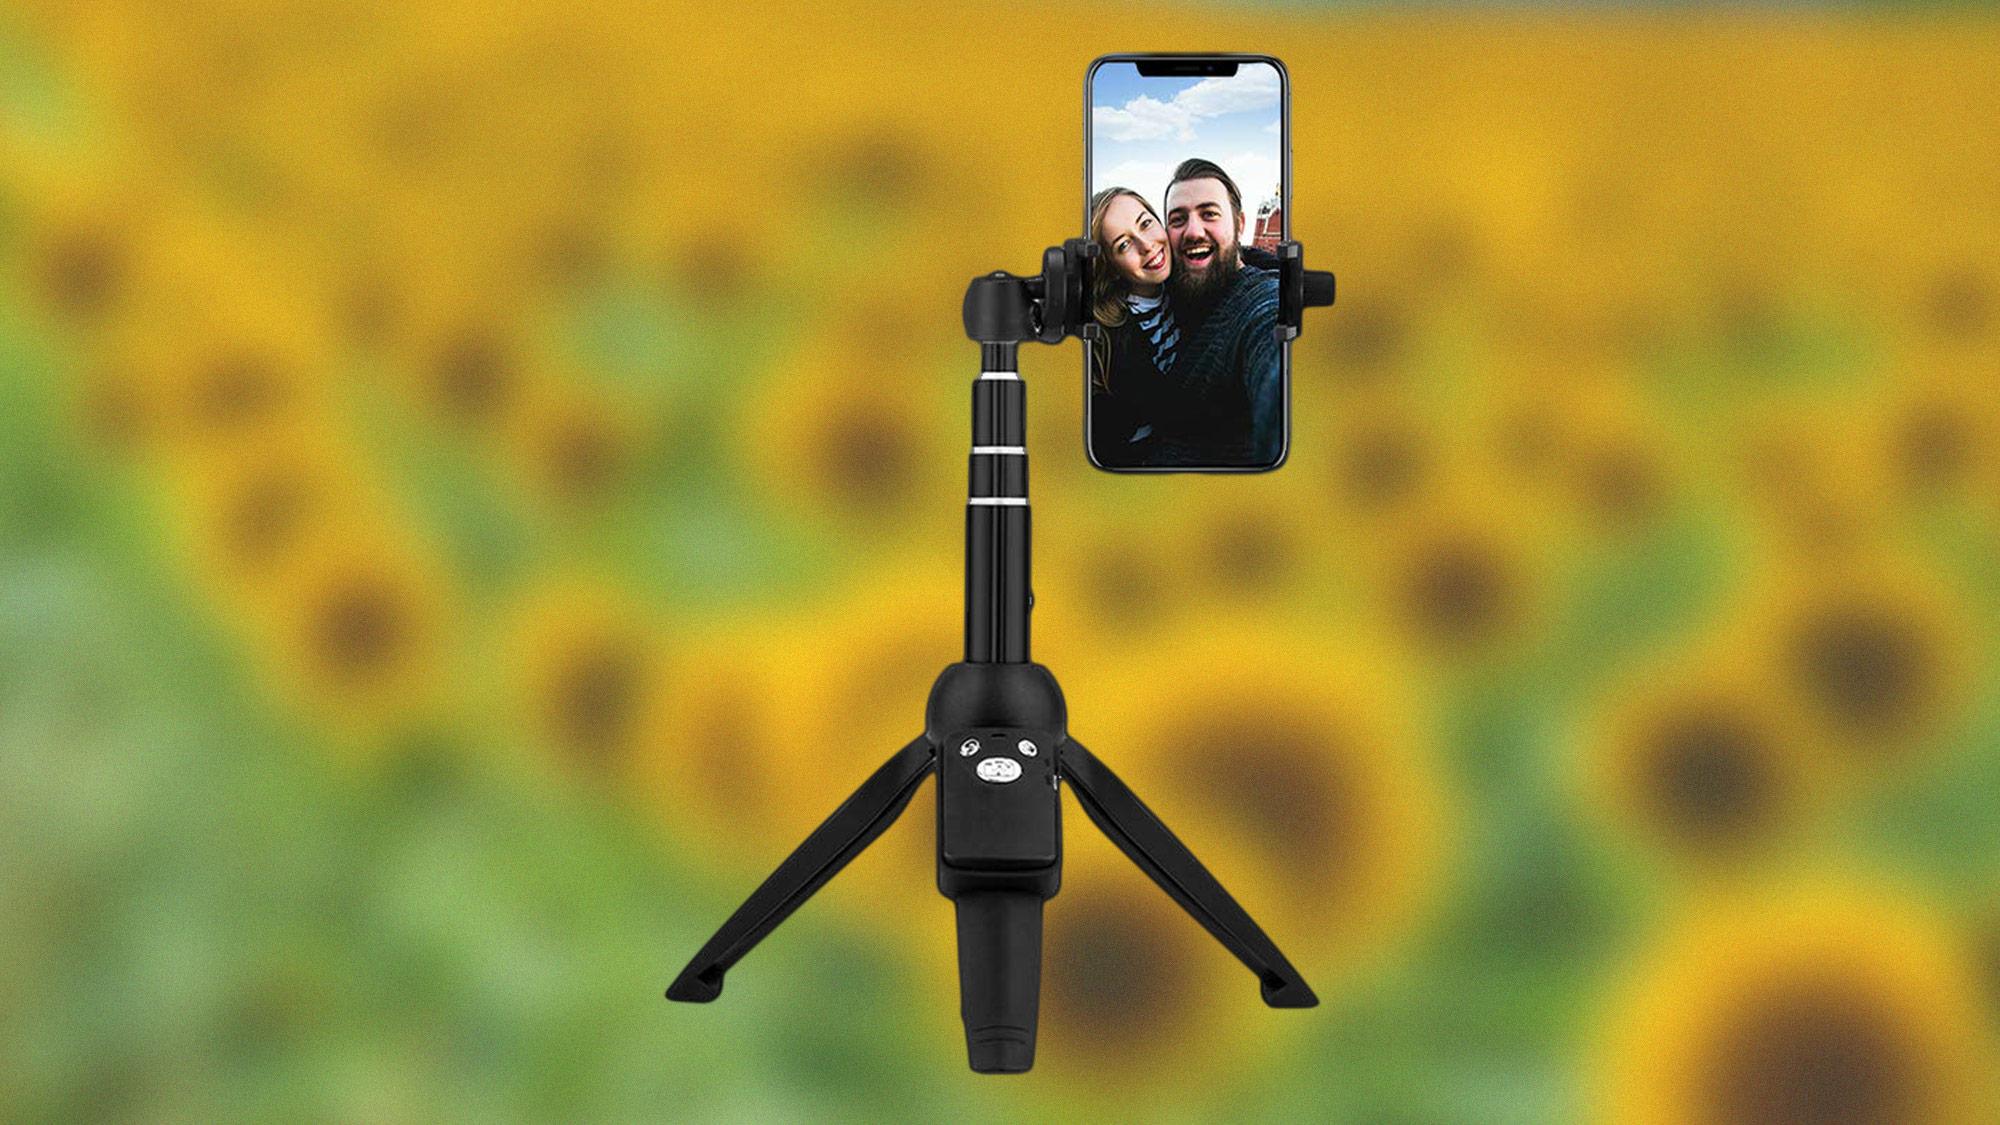 best iPhone tripods: Bluehorn 40-inch selfie-stick tripod